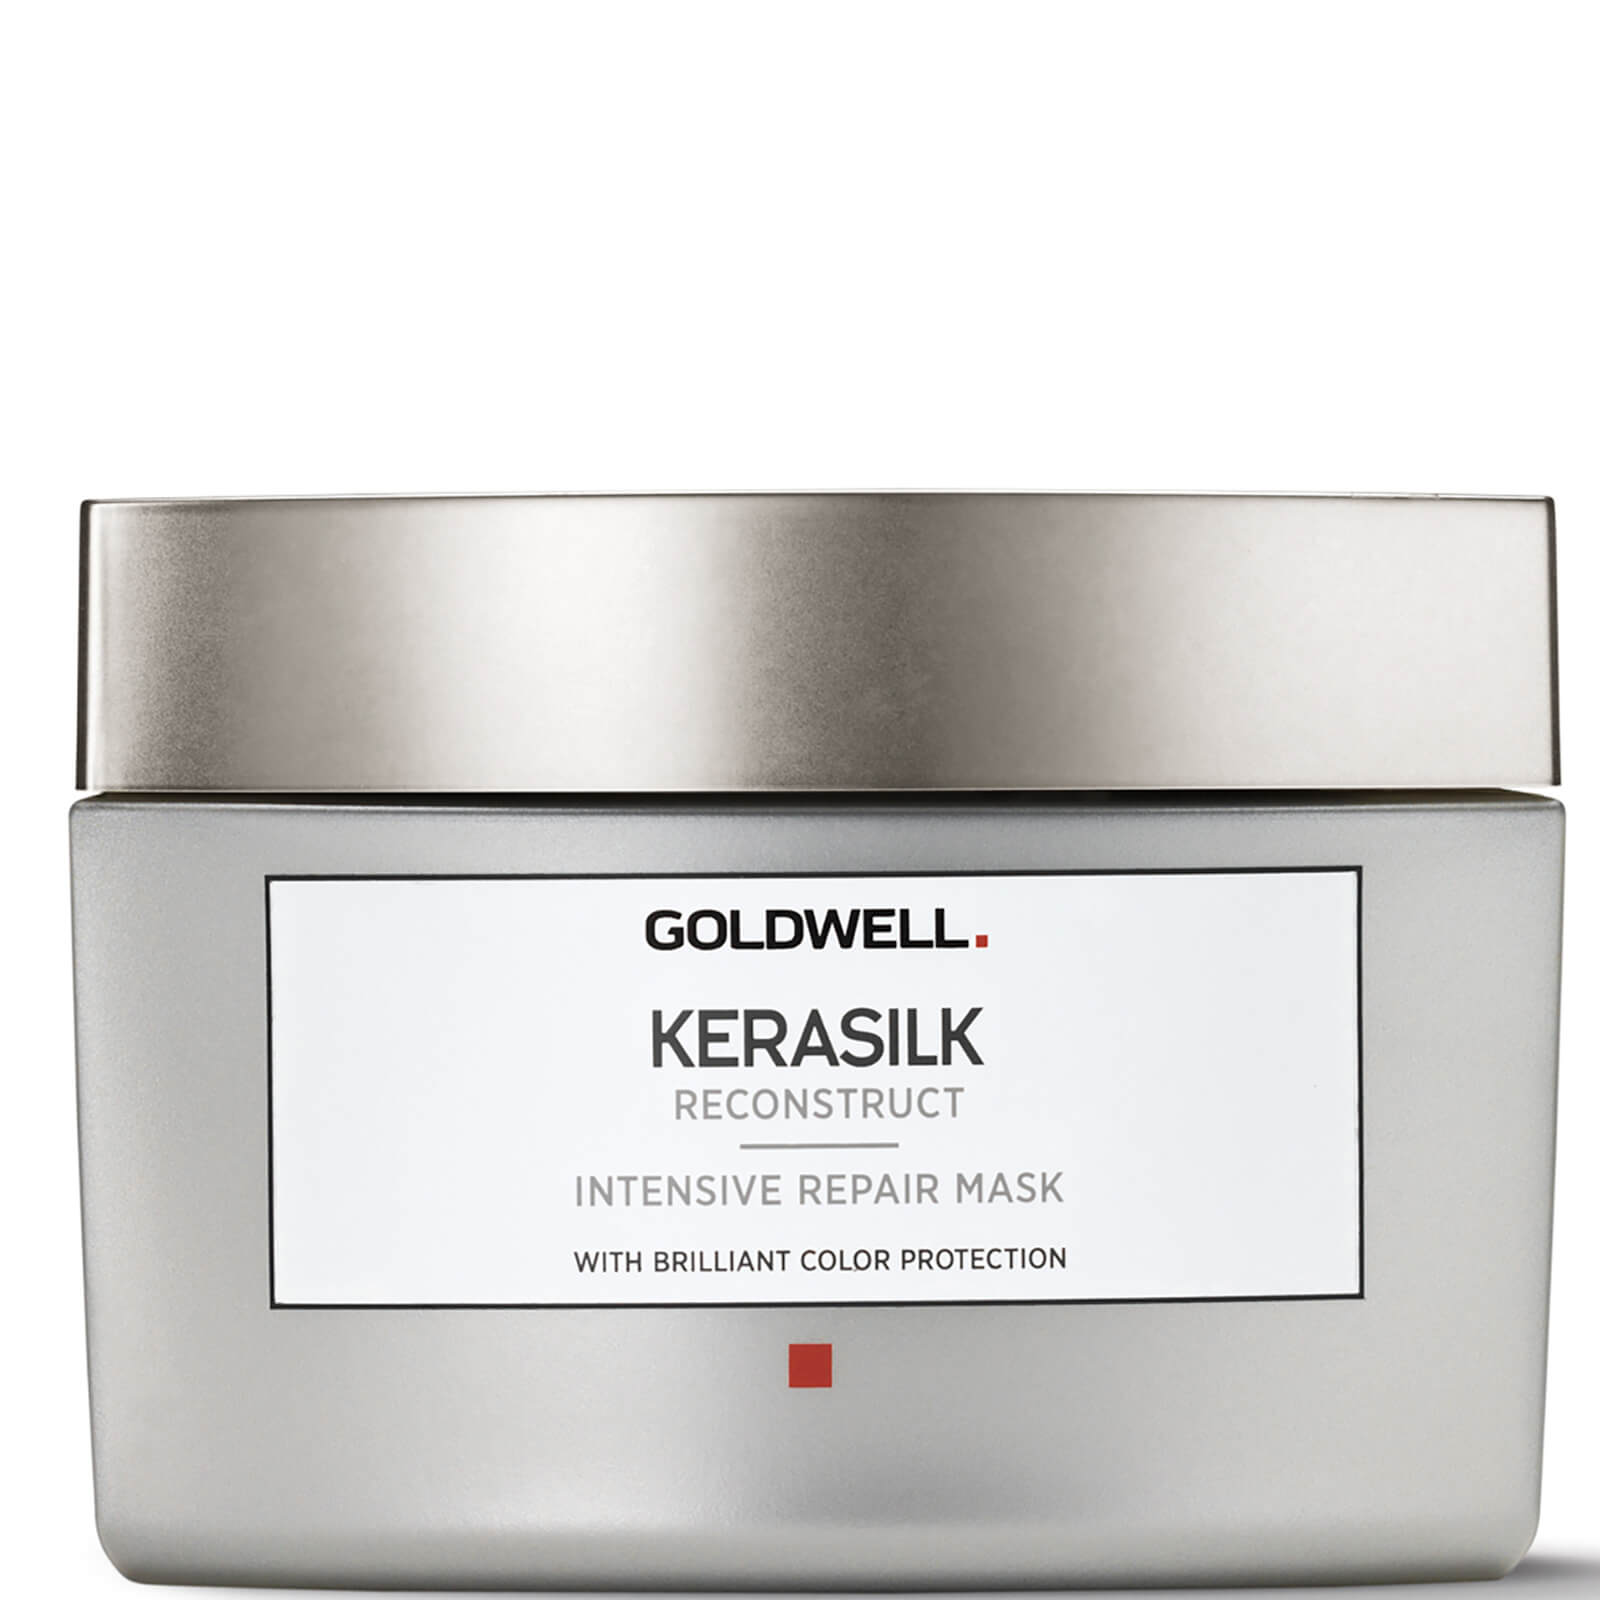 Goldwell Kerasilk Re-construct Intensive Repair Mask 200ml